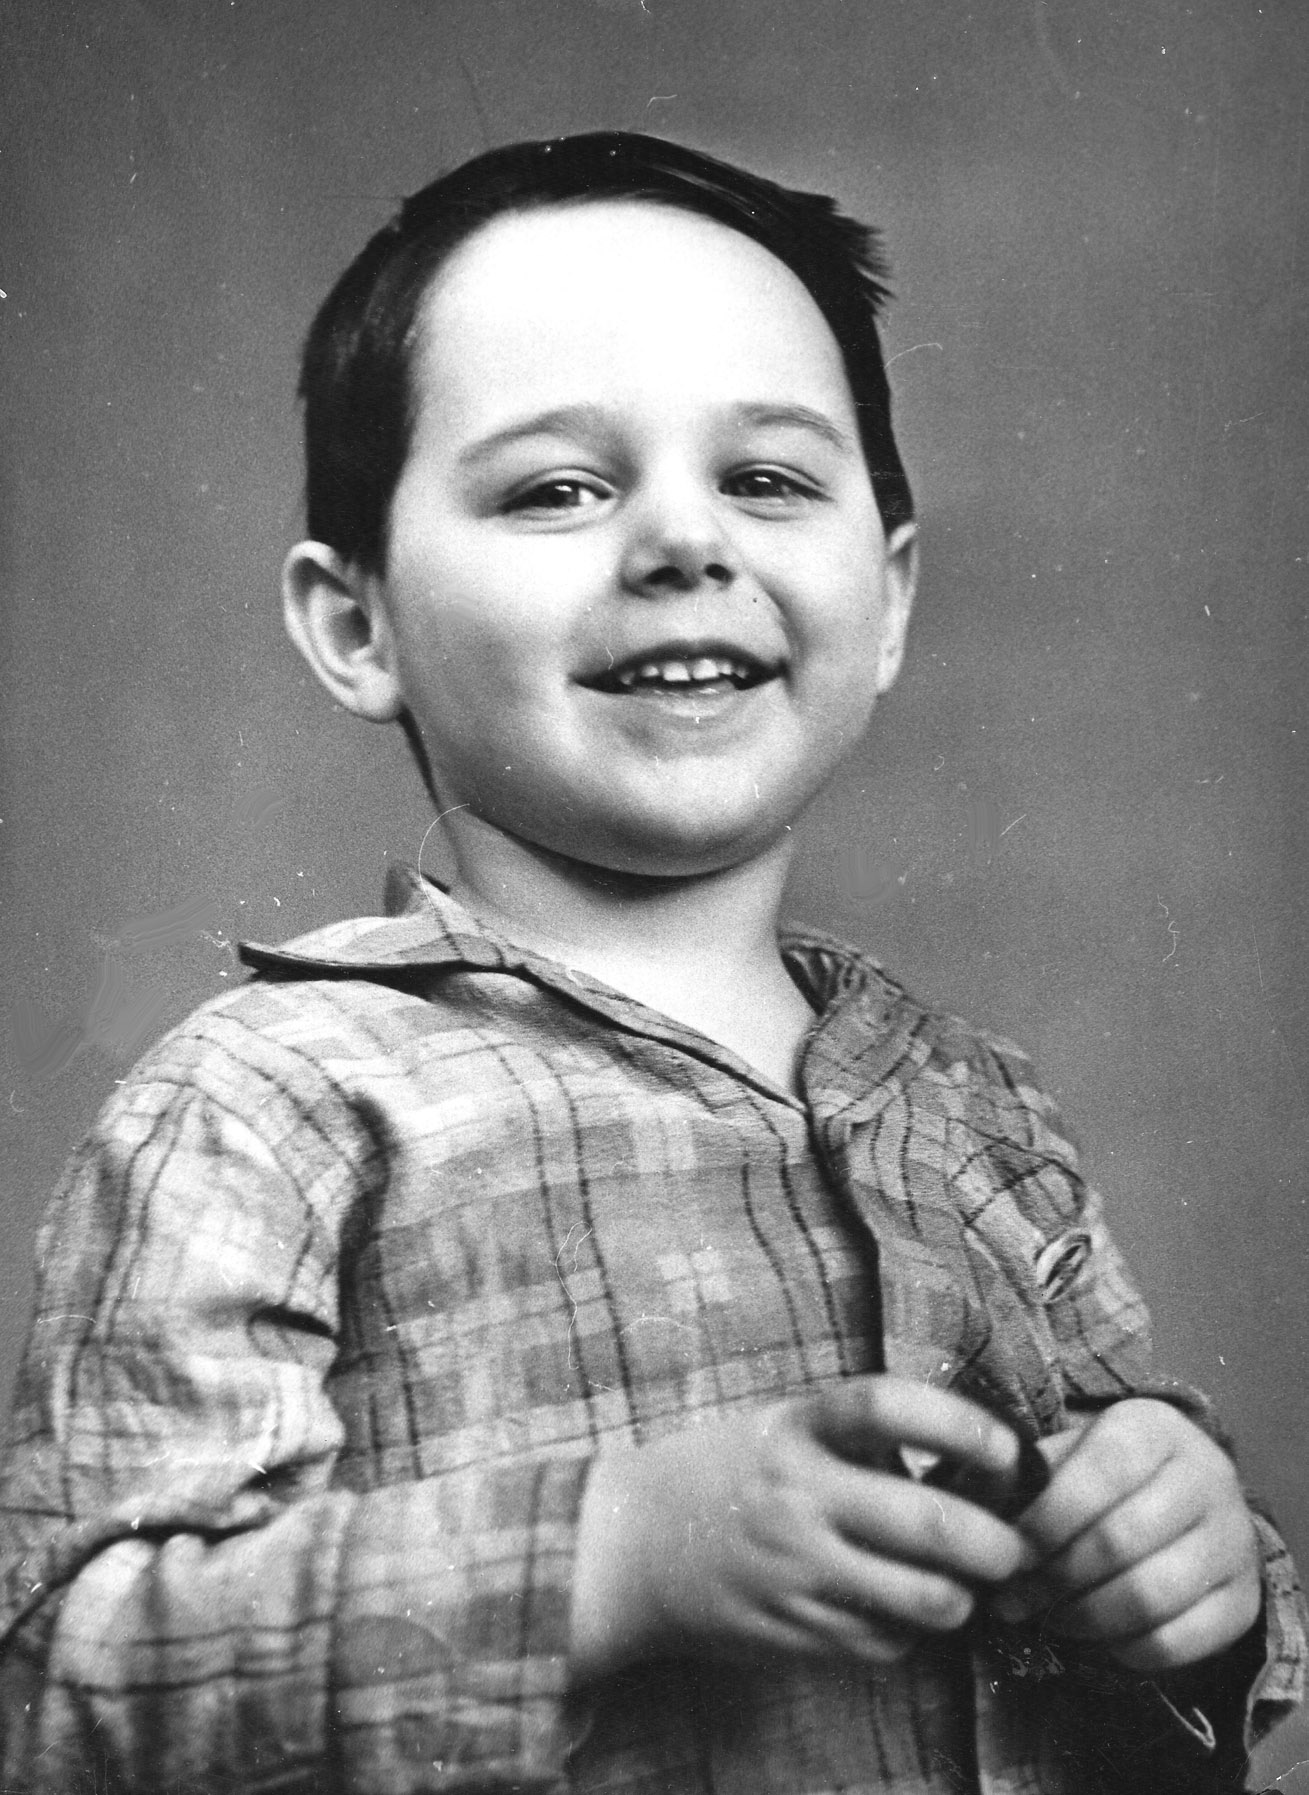 1965-A-07